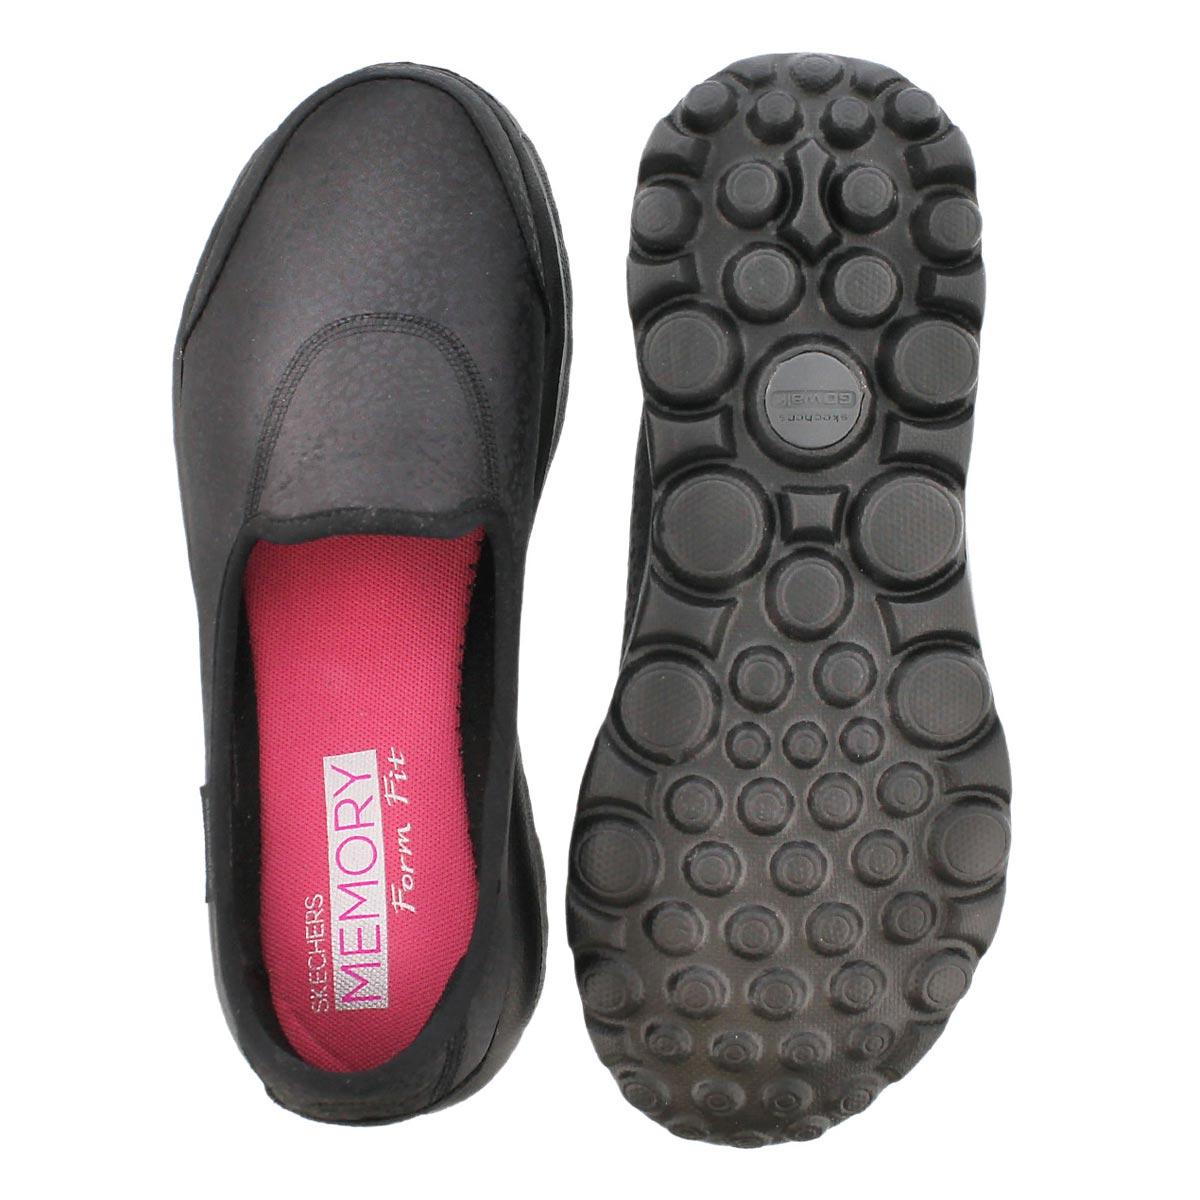 Fl�neurs GOwalk- Untamed, noir, fem